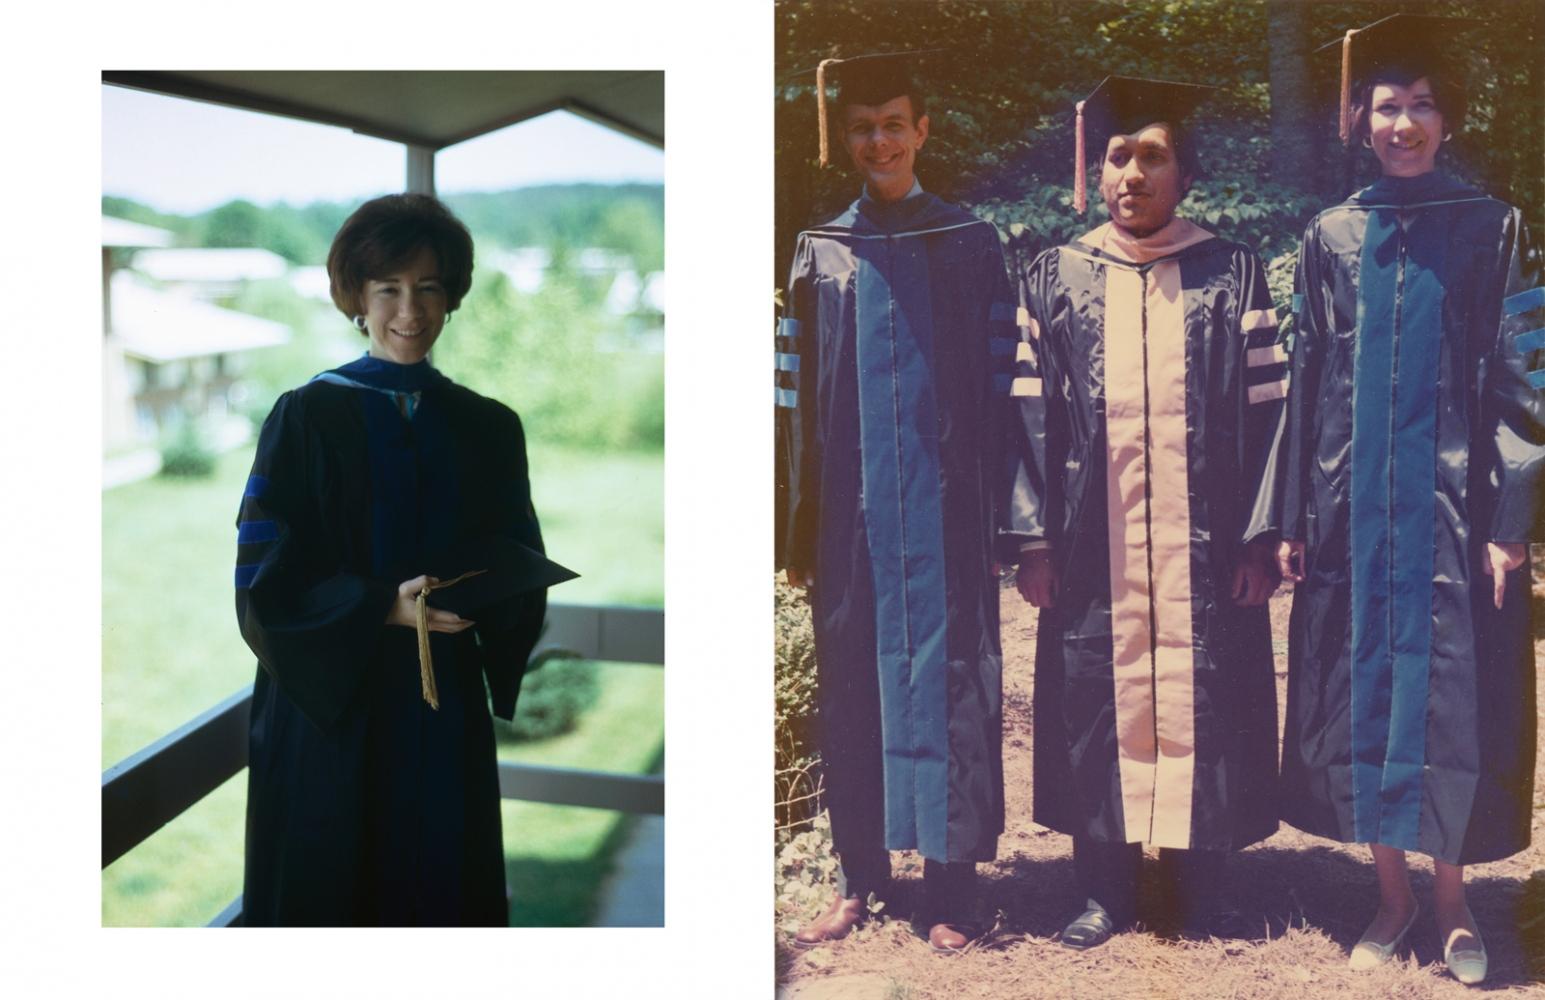 Judy and John Klaas receive their PhDs at University of North Carolina